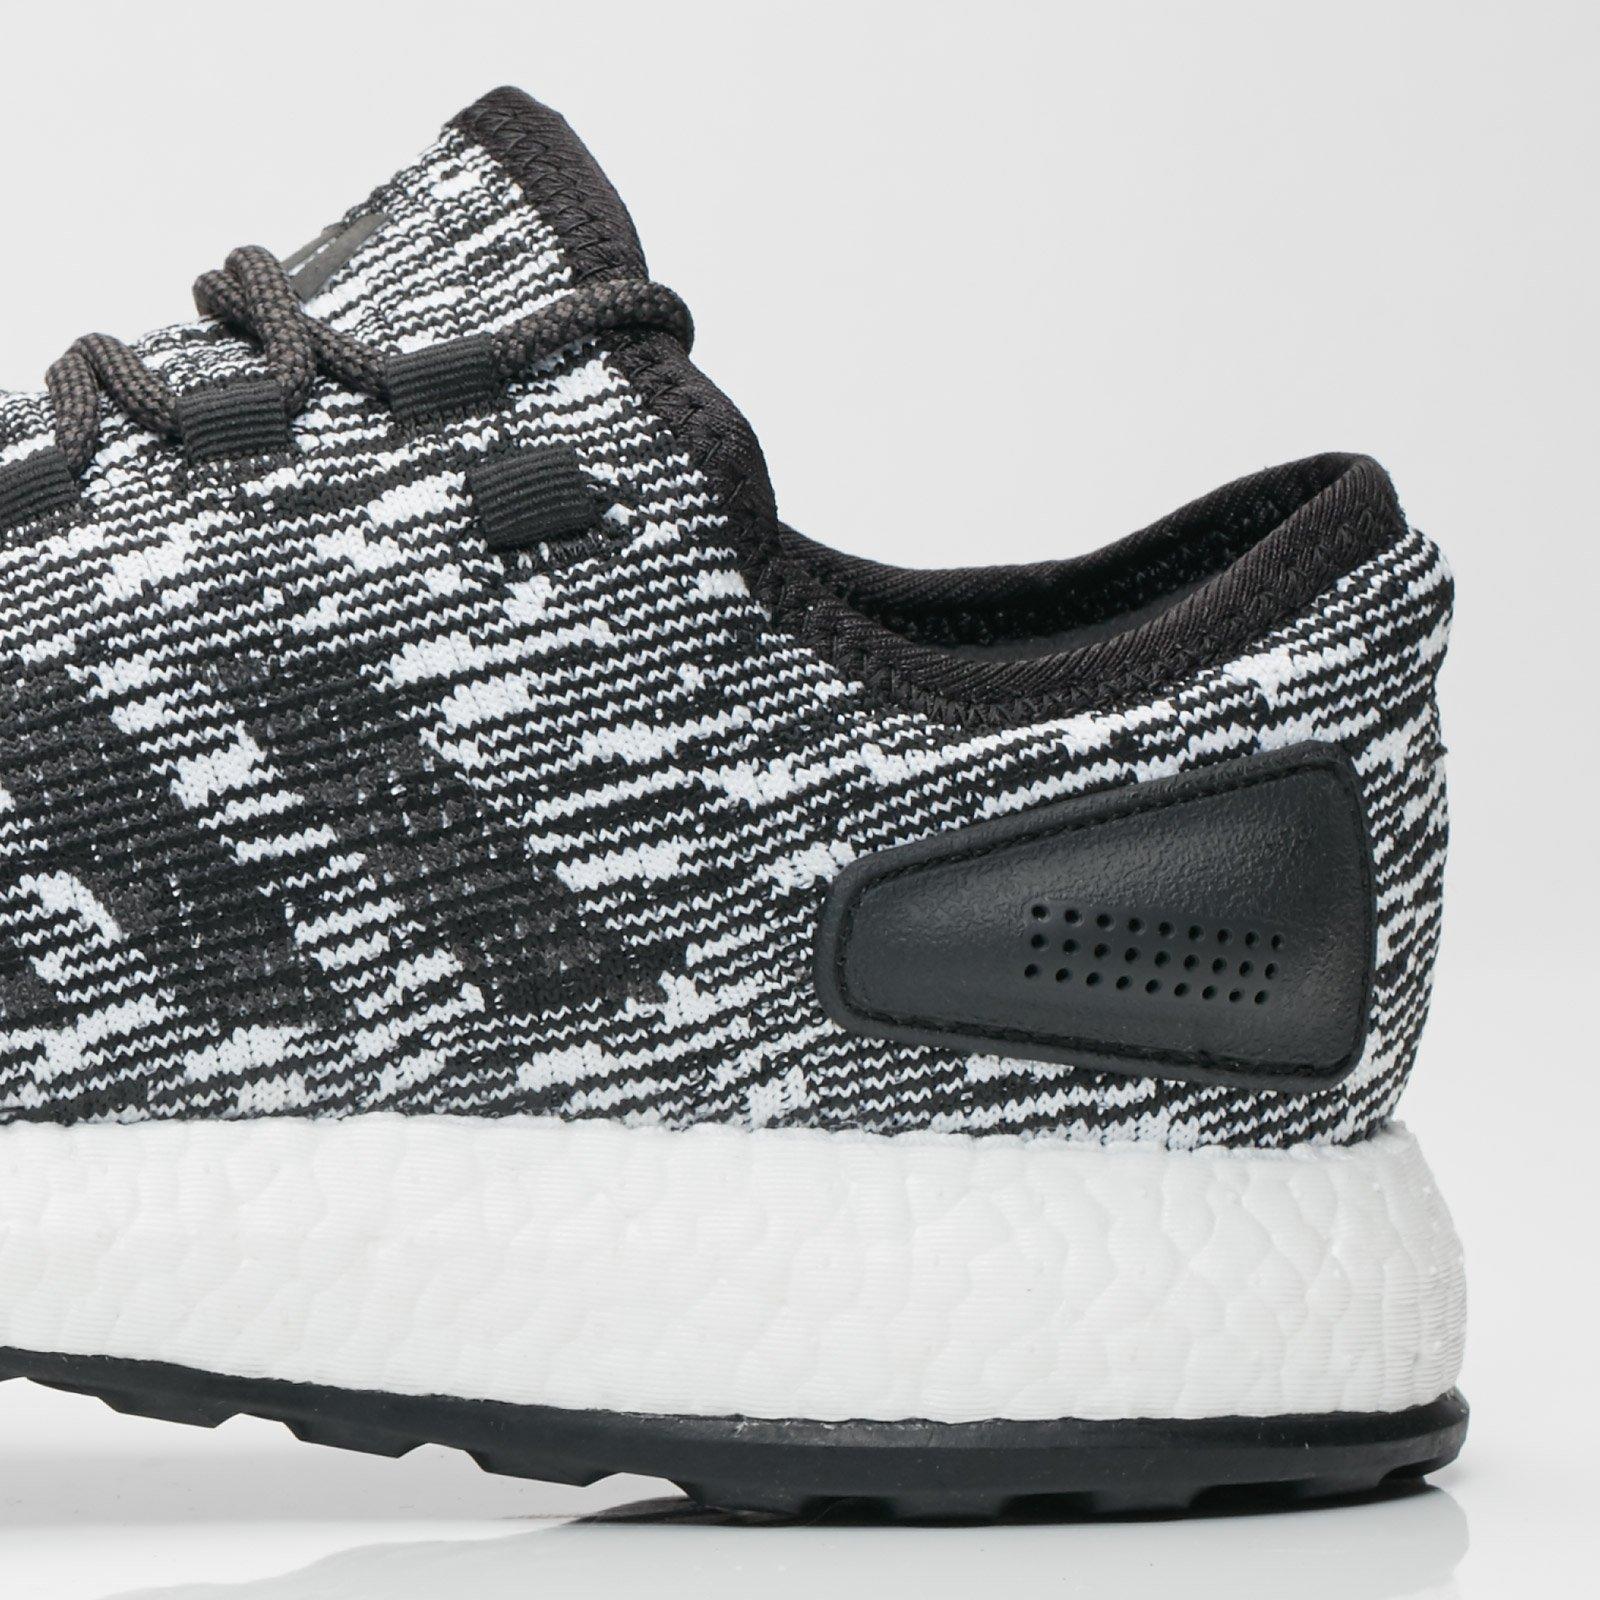 0e9c3f749 adidas PureBOOST - Bb6280 - Sneakersnstuff